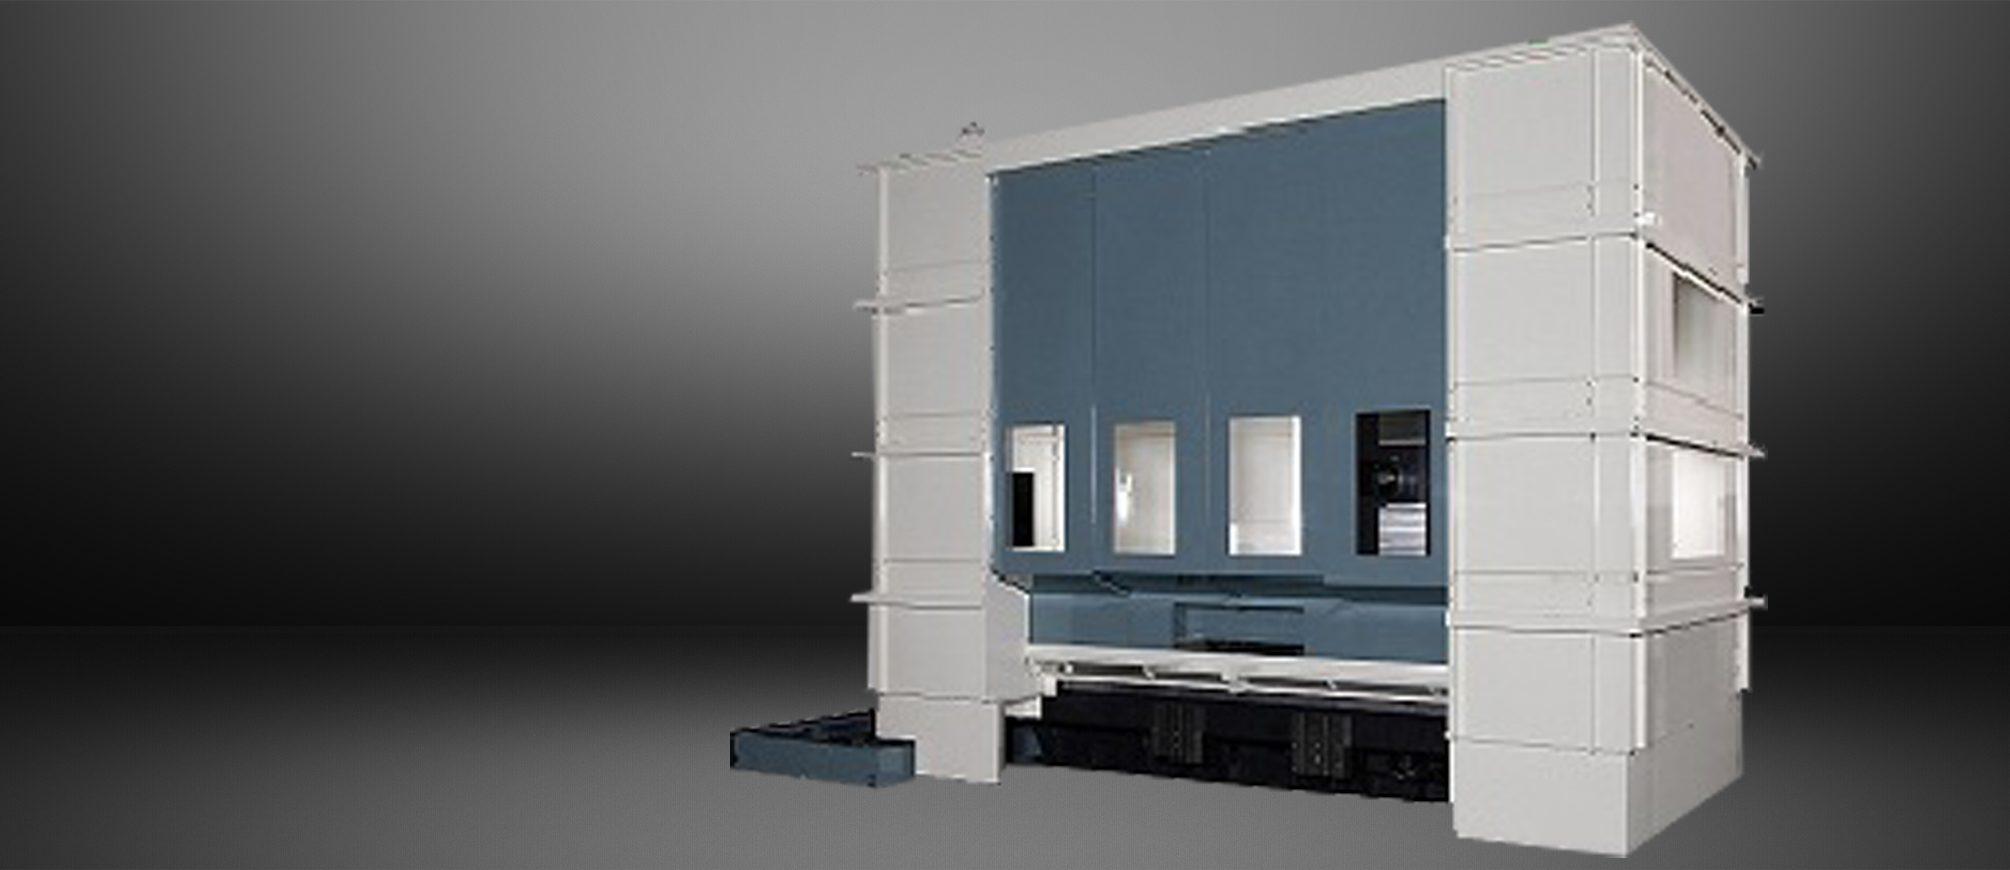 HN1600-S BAR Horizontal Machining Centers